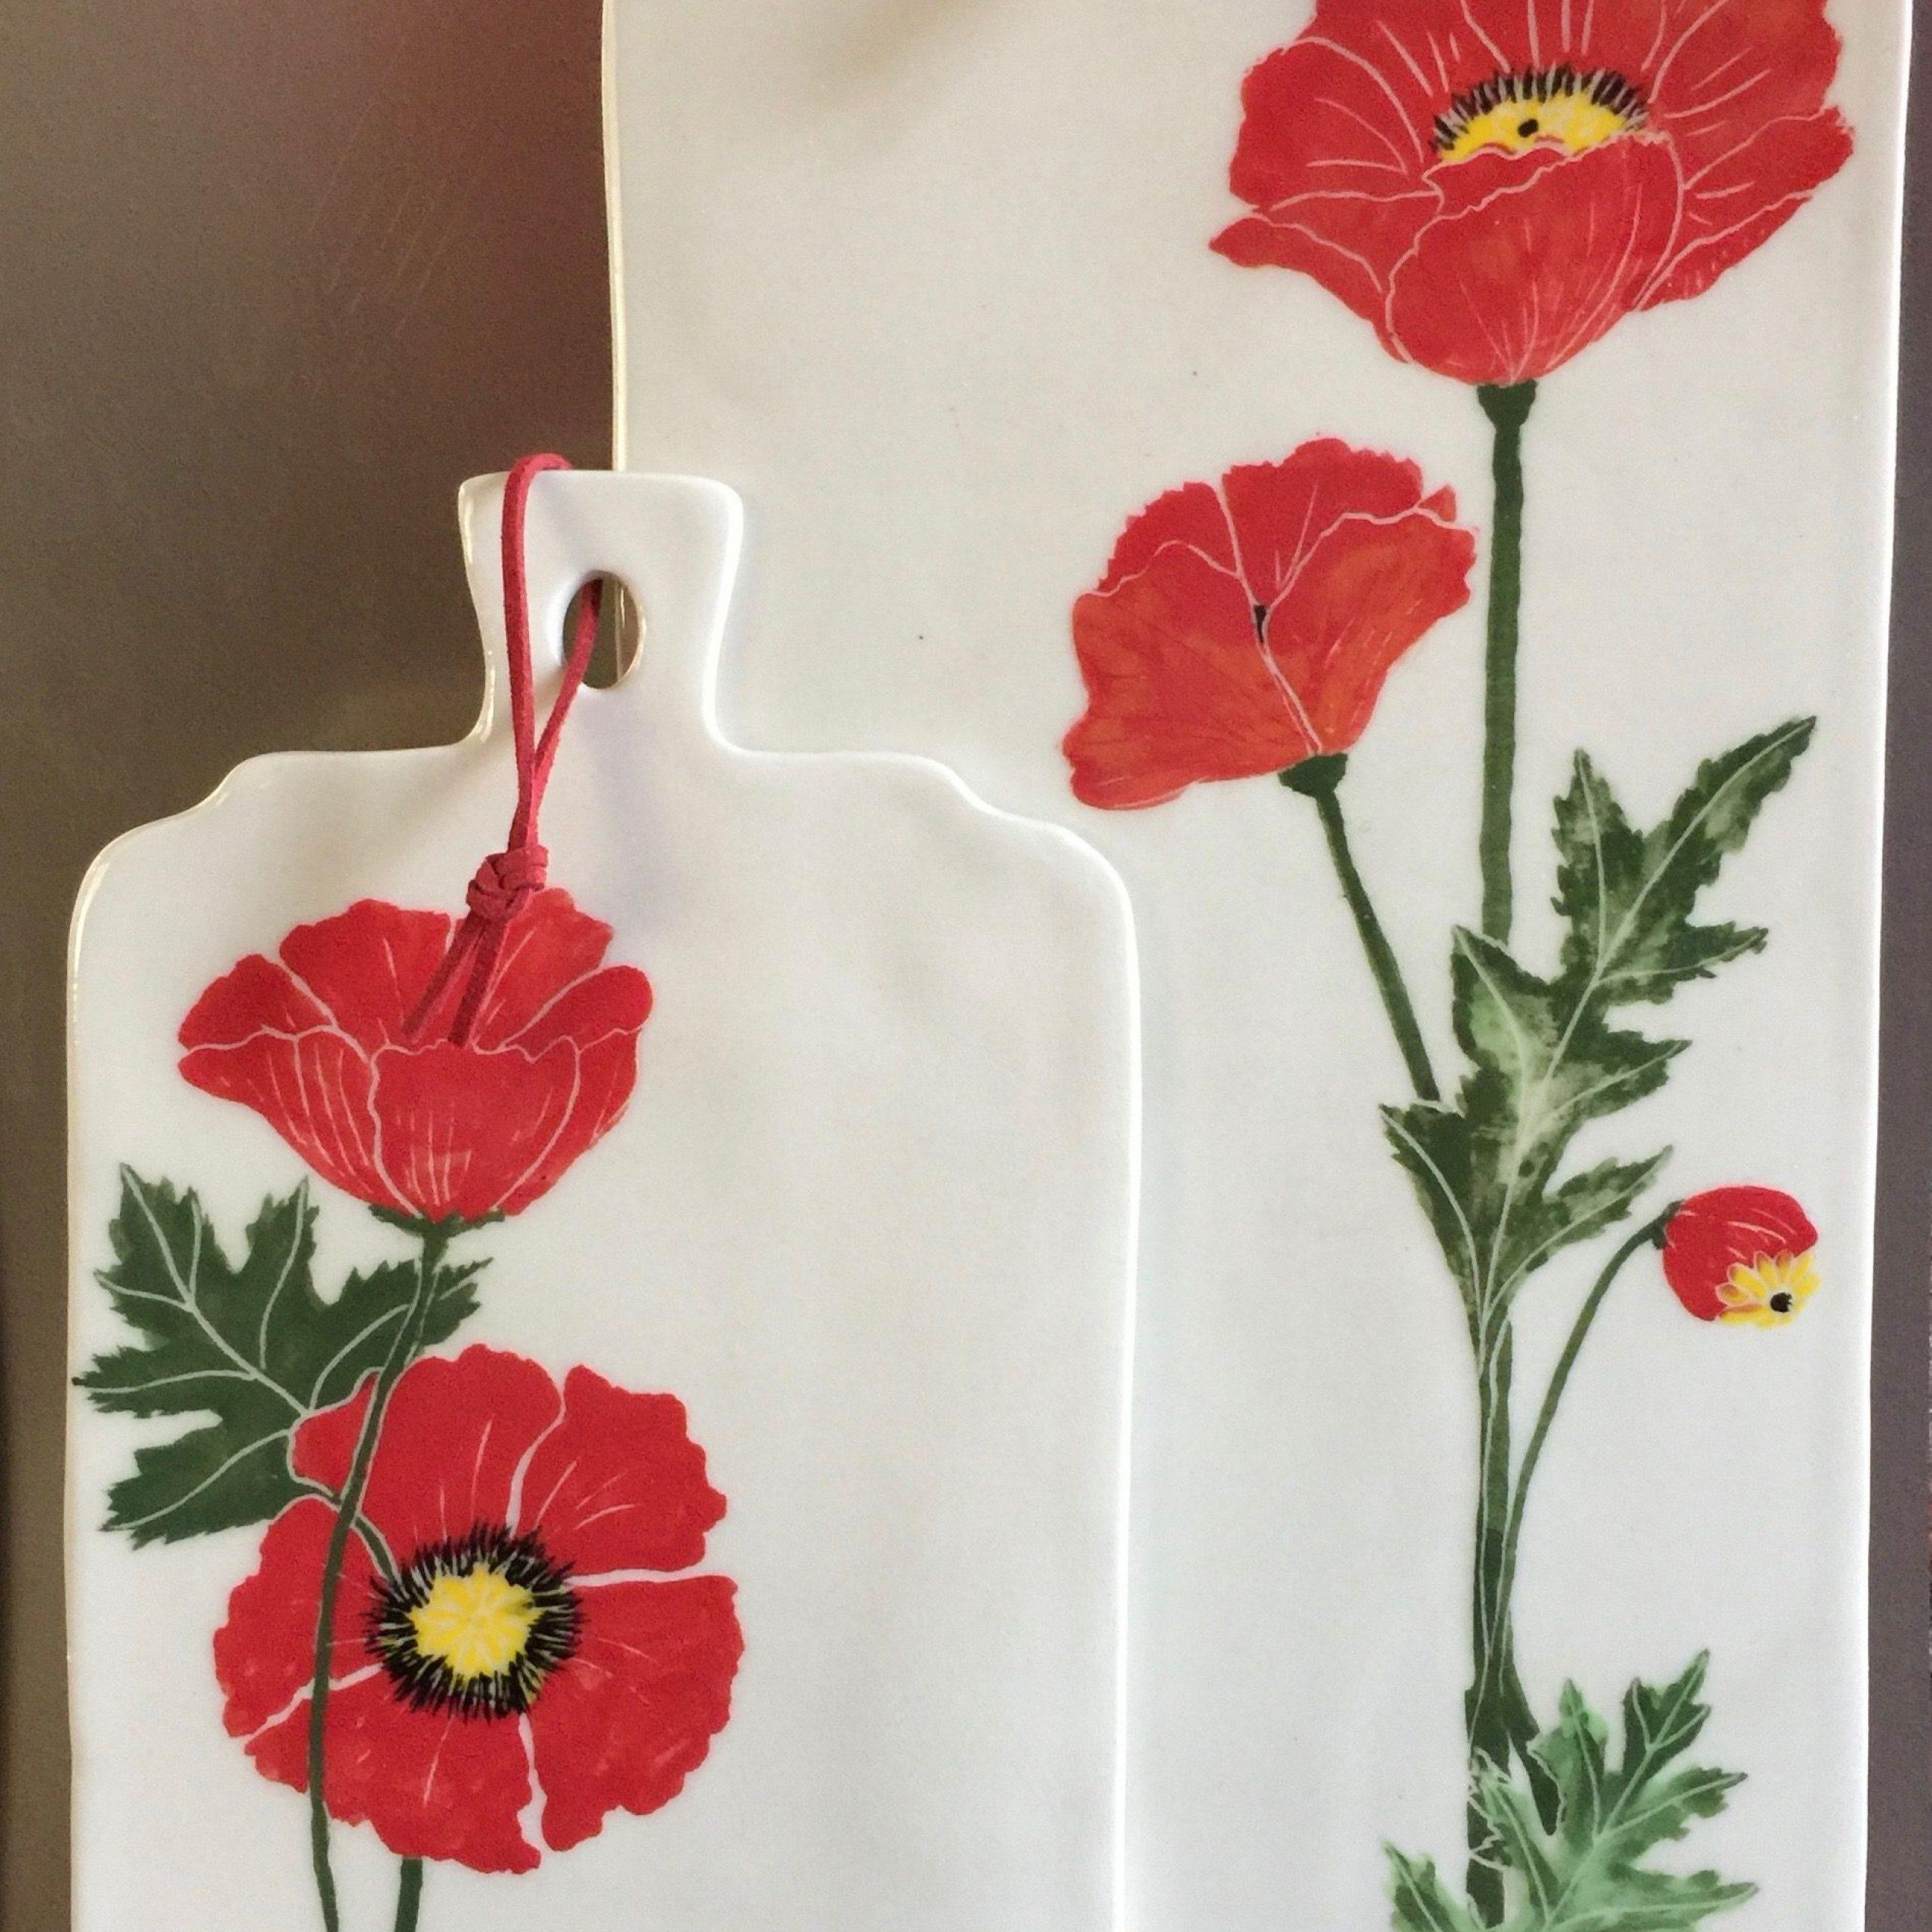 Poppy Cheese Boardsmarie Wetzel | Pottery Designs Within Wilde Poppies Ceramic Garden Stools (View 25 of 25)